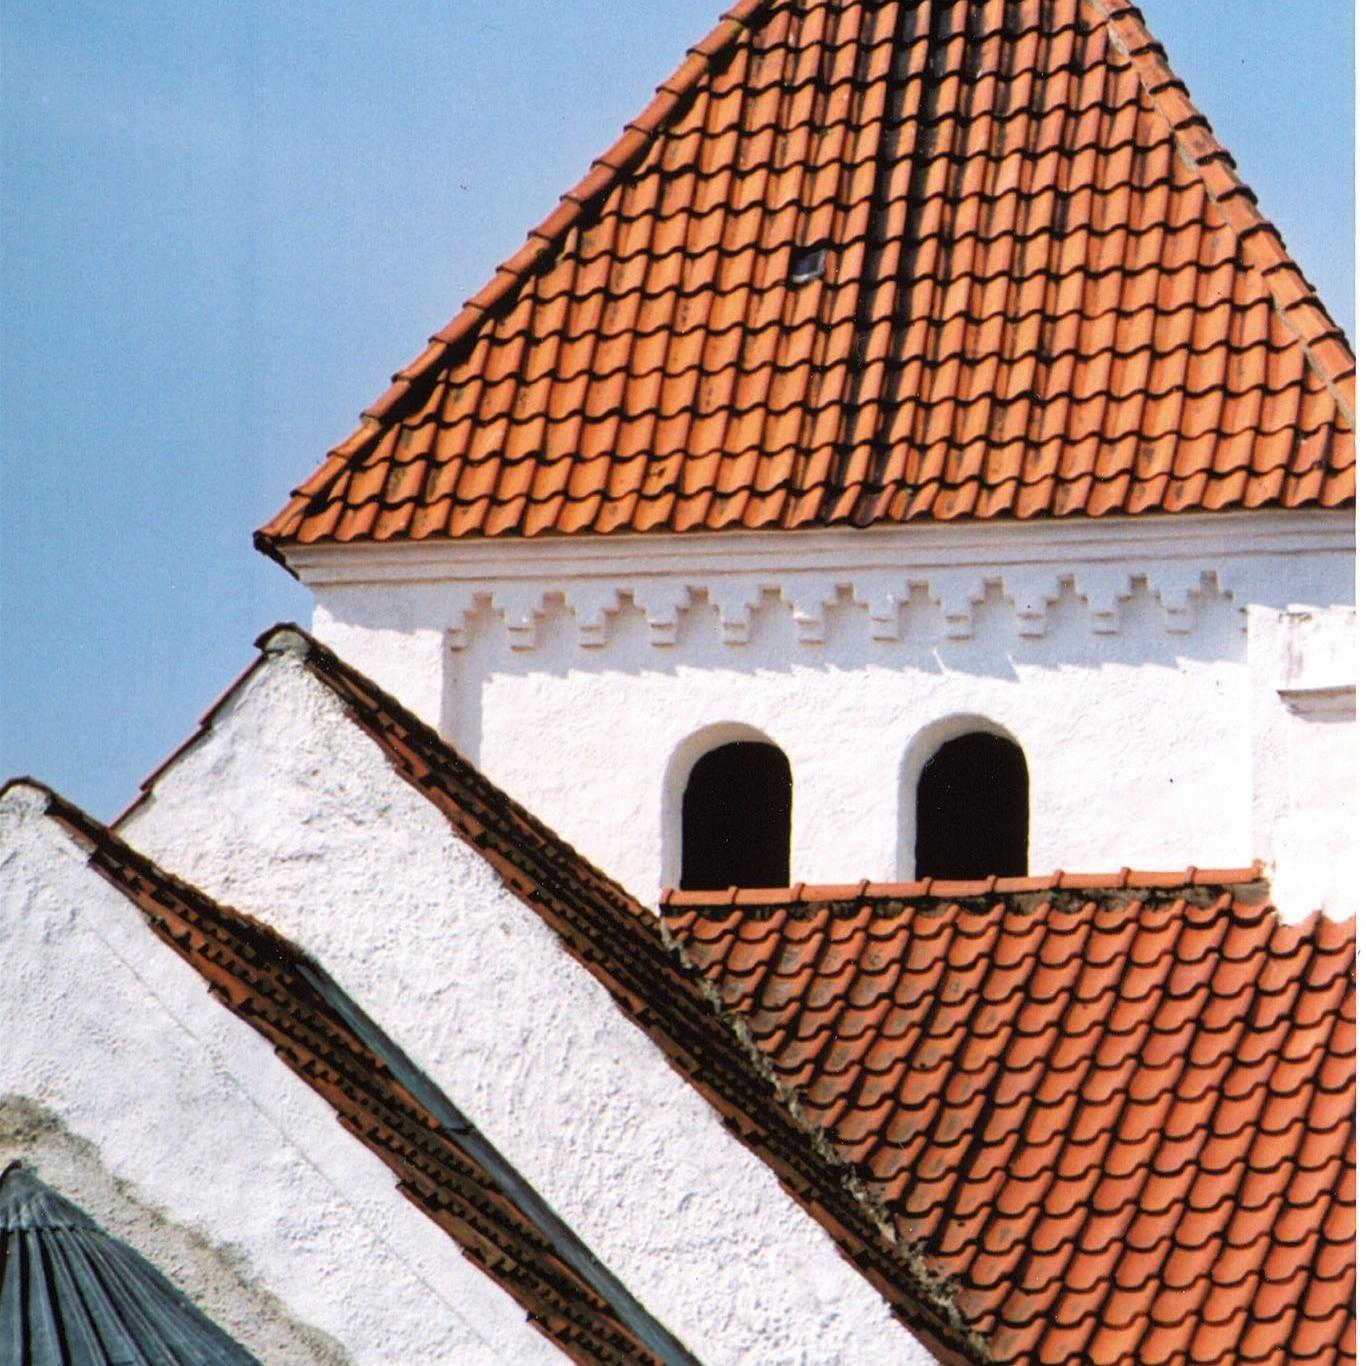 © Kävlinge kommun, Hofterups Kirche